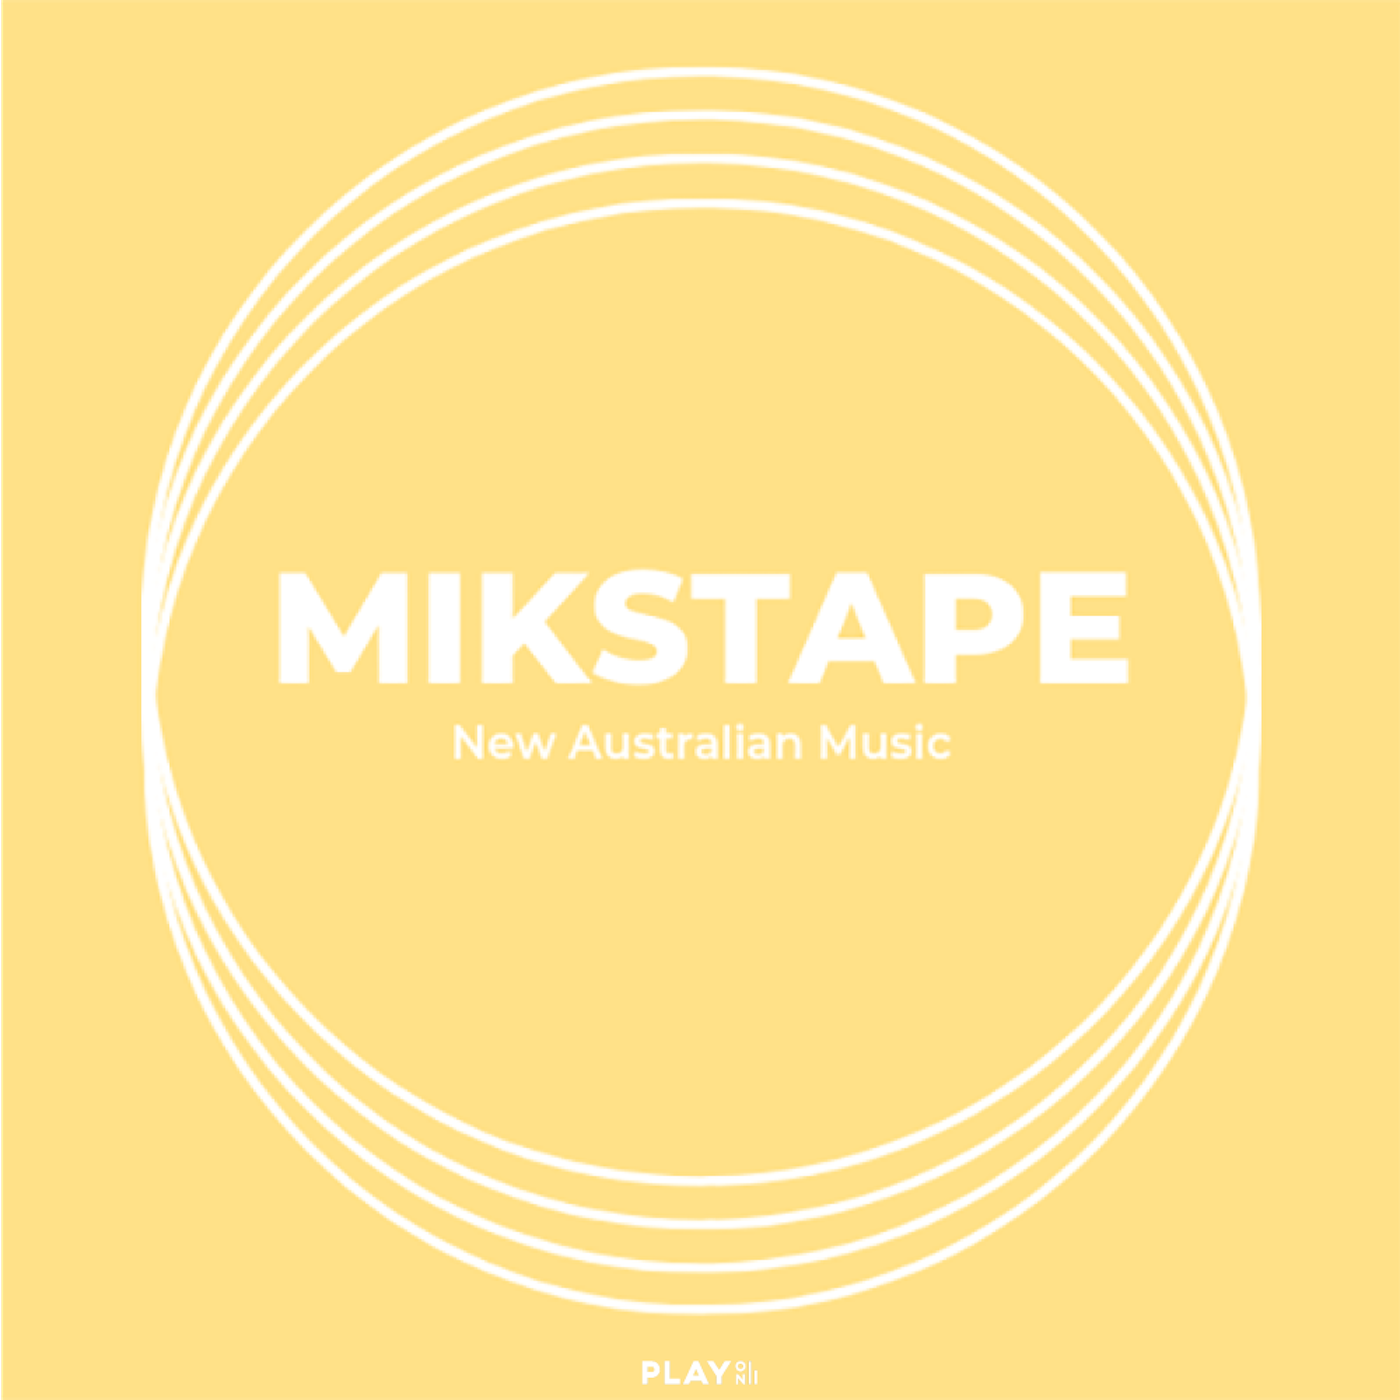 Mikstape_Whooshkaa_1.png